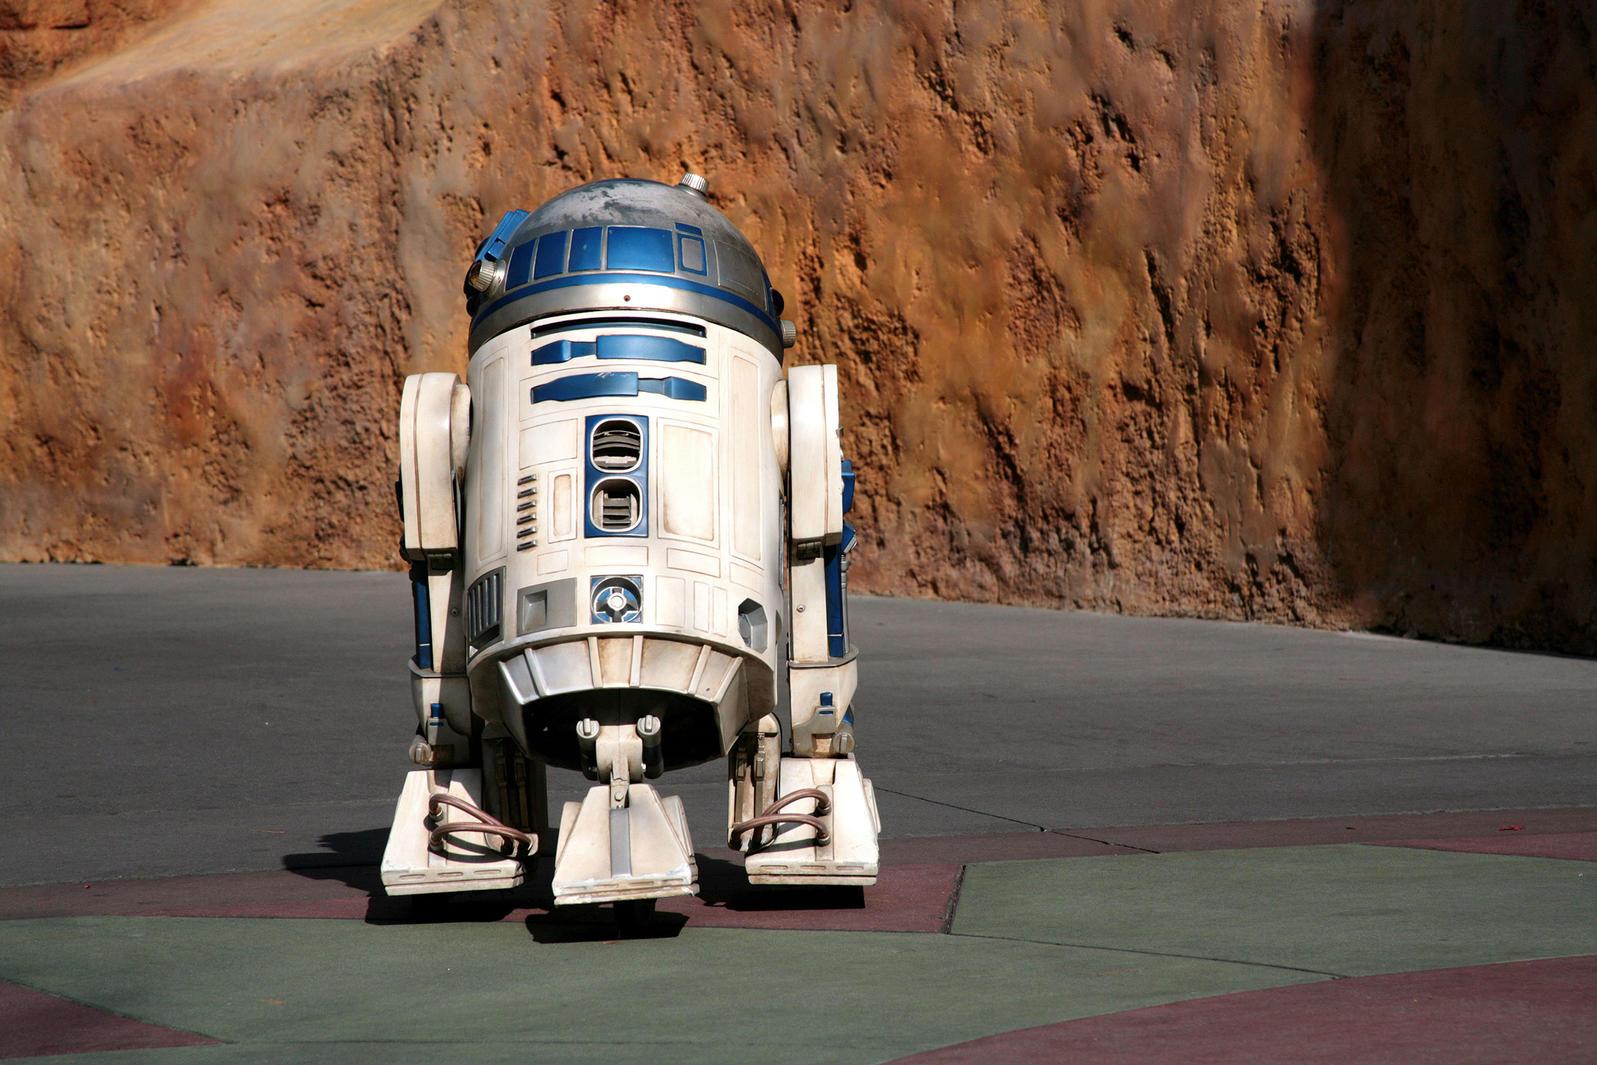 R2-D2. JJM Stock Photography/Alamy